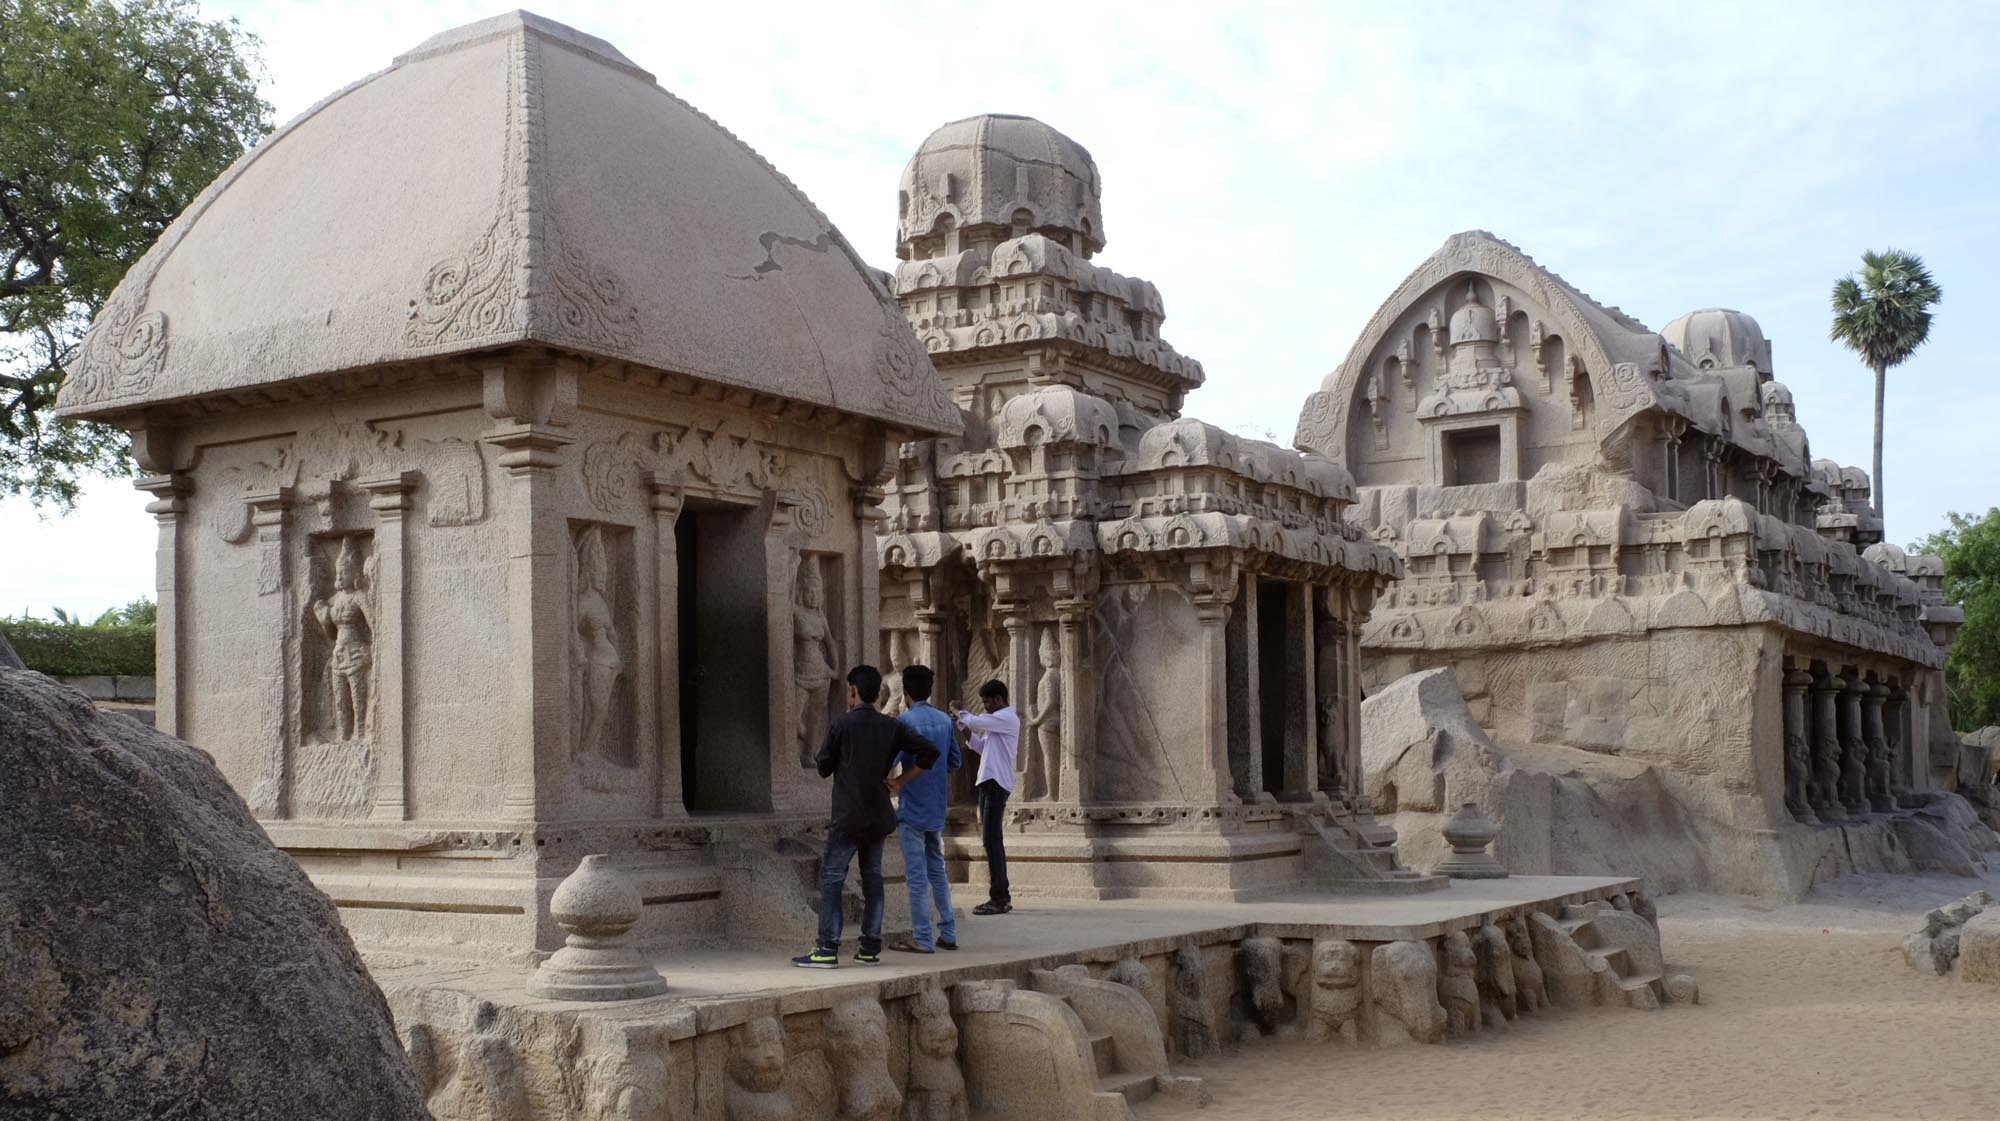 reise-ansichten Mamallapuram 5 Rathas